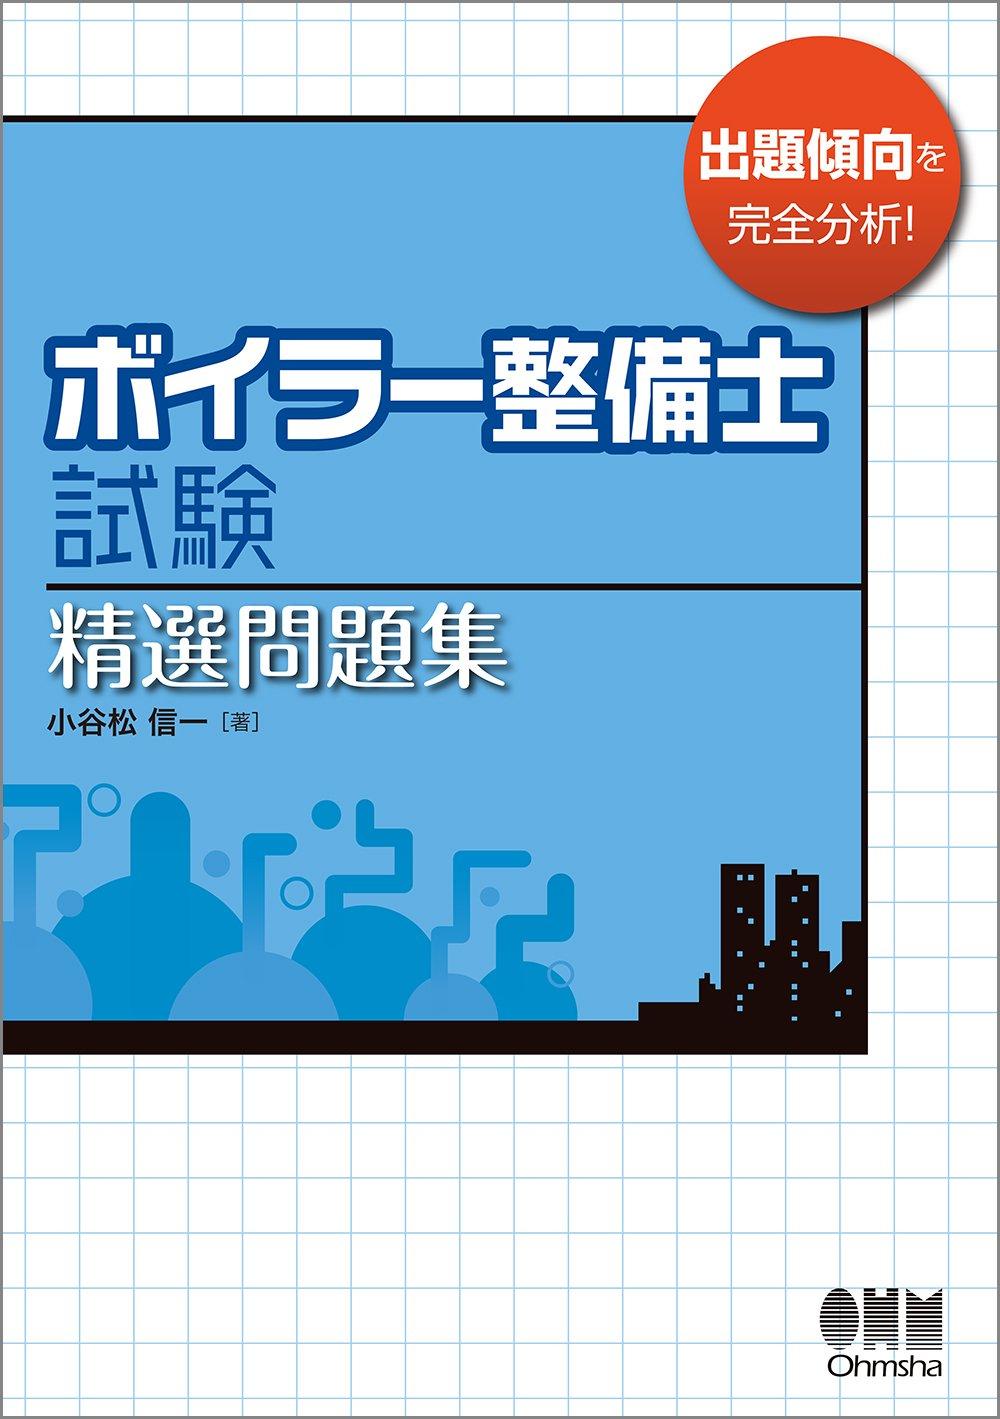 ボイラー整備士試験 精選問題集 単行本2016/9/17